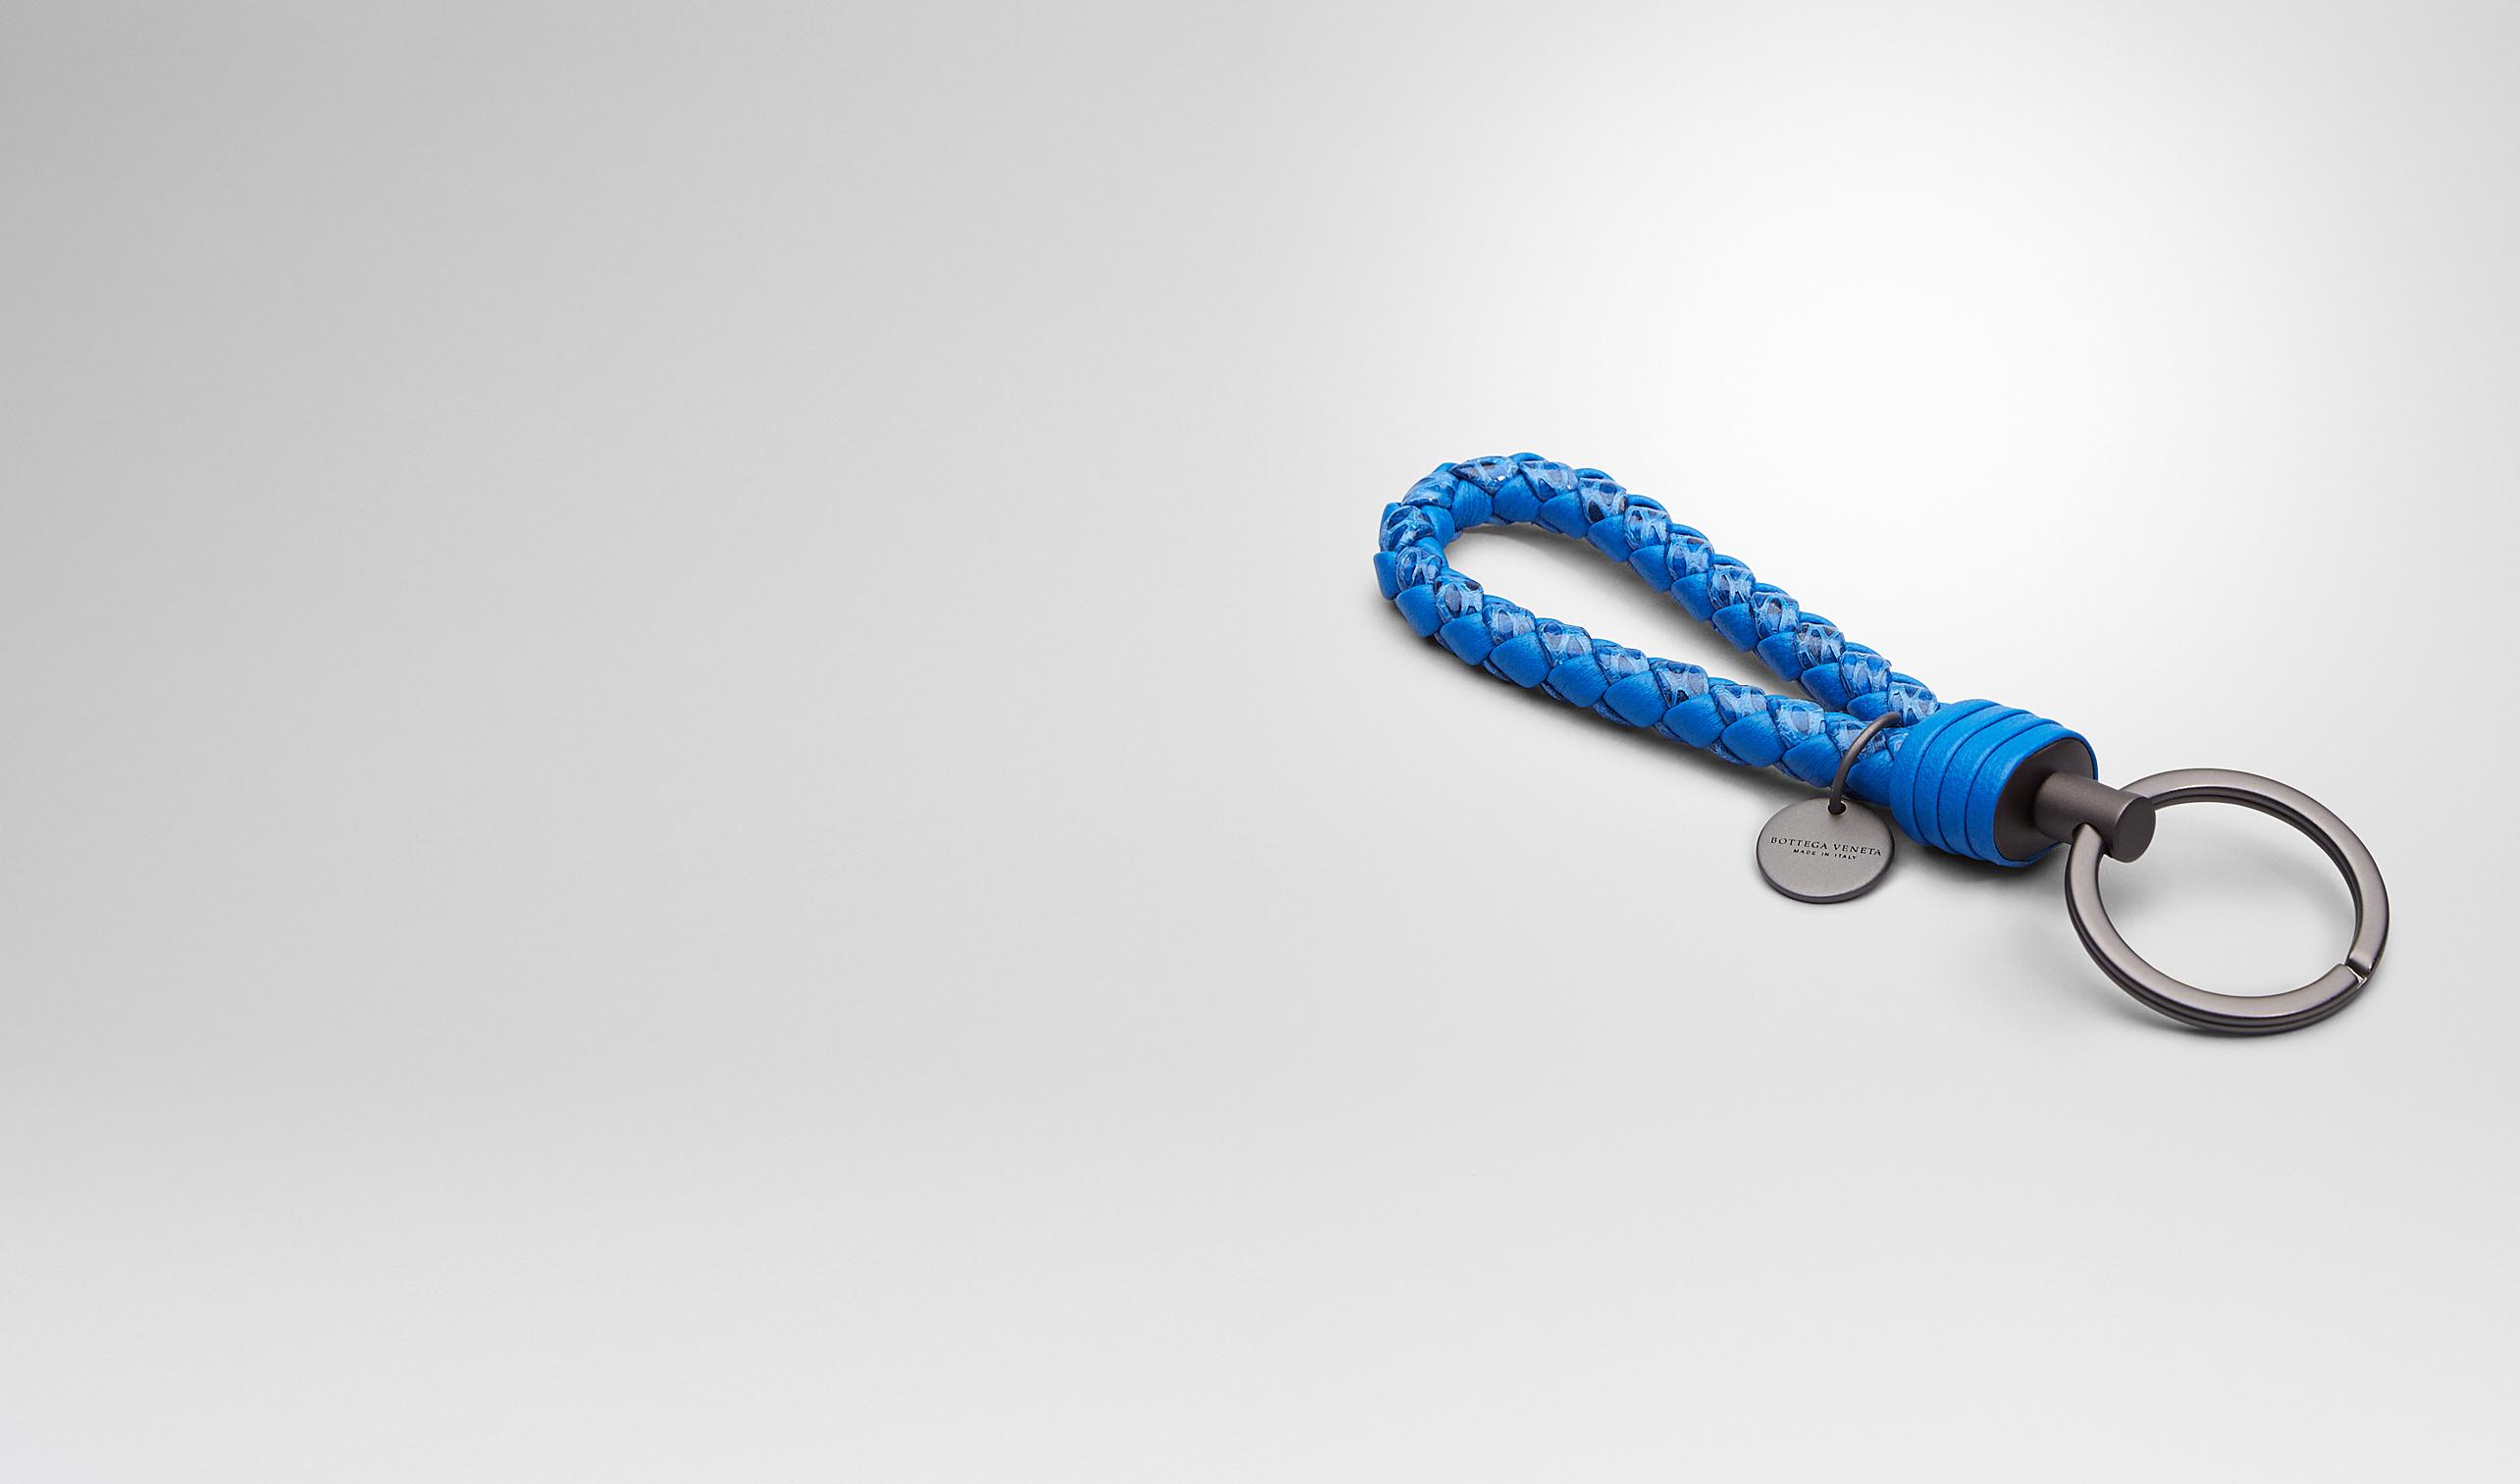 BOTTEGA VENETA Schlüsselring oder Armband E SCHLÜSSELANHÄNGER aus Ayers Livrea Intrecciato SIGNAL BLUE pl